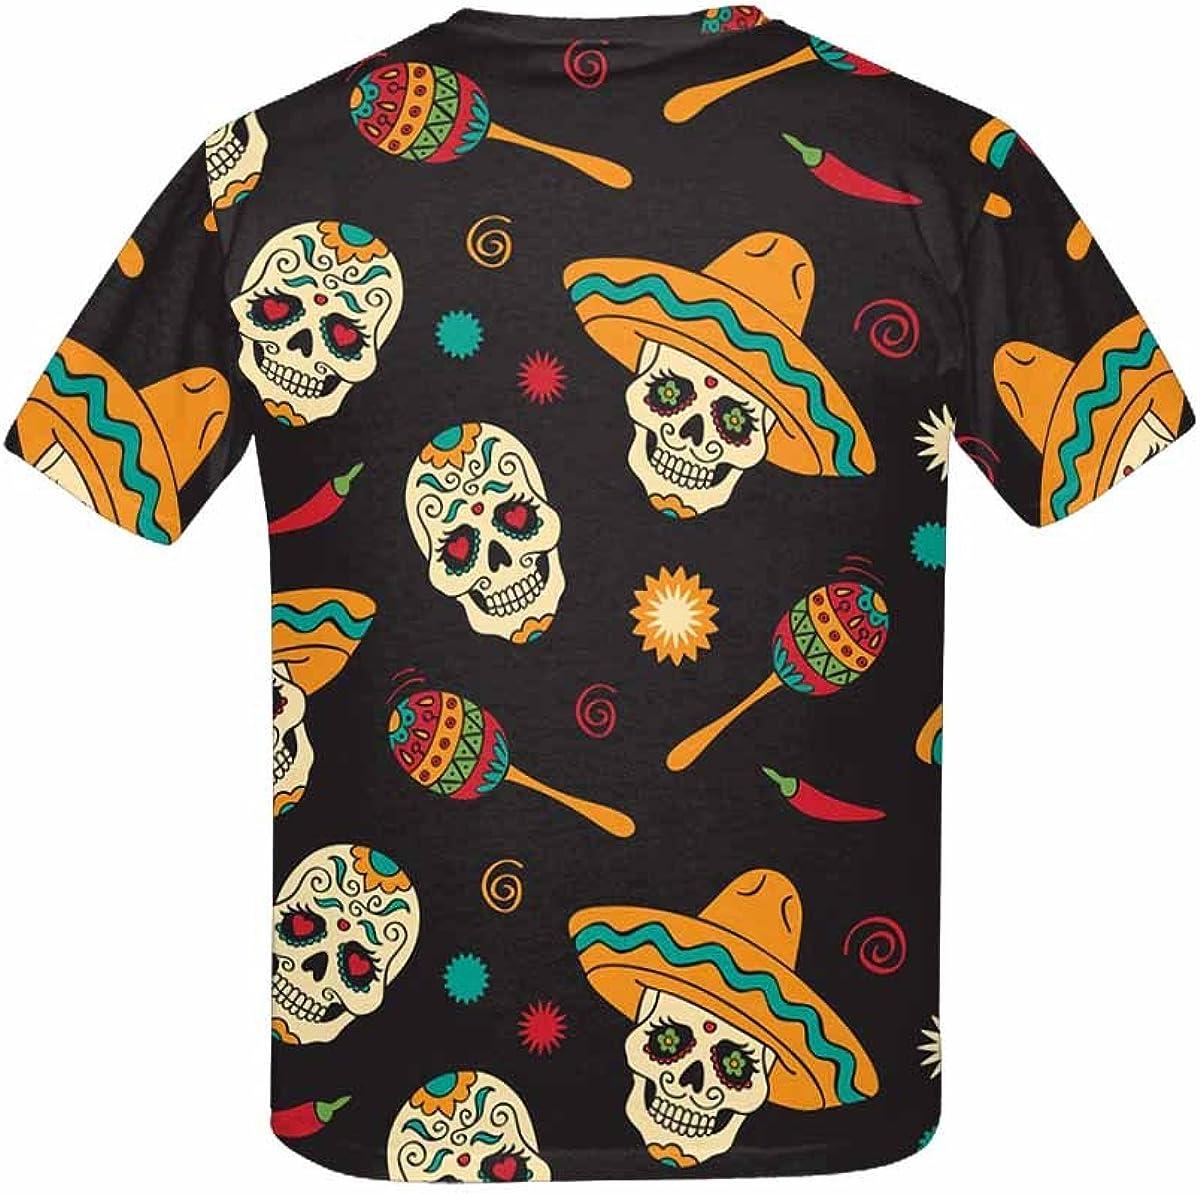 XS-XL INTERESTPRINT Childs T-Shirt Sugar Skulls